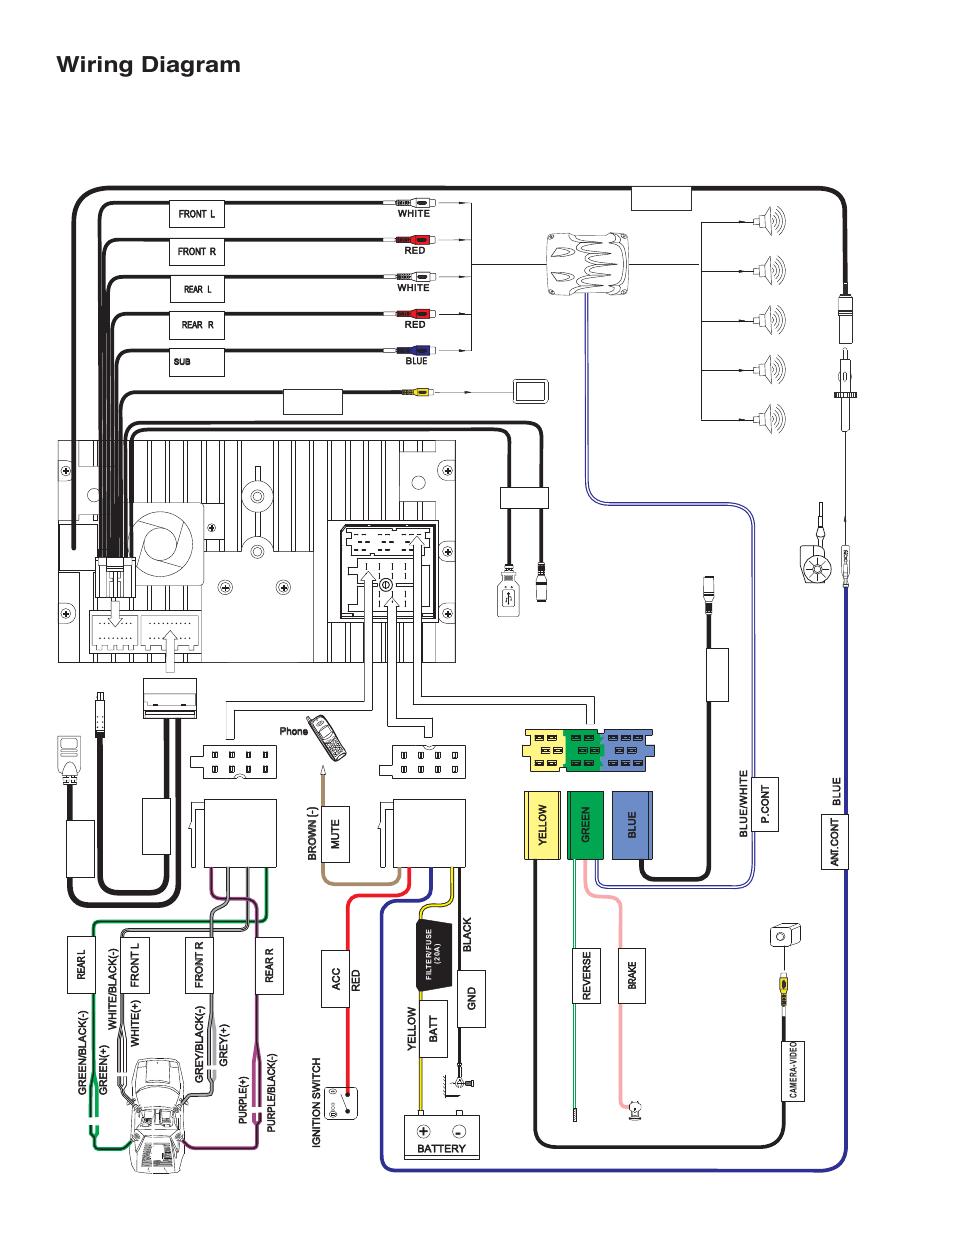 phase linear car radio wiring diagram - wiring diagrams blog  palox-france.fr